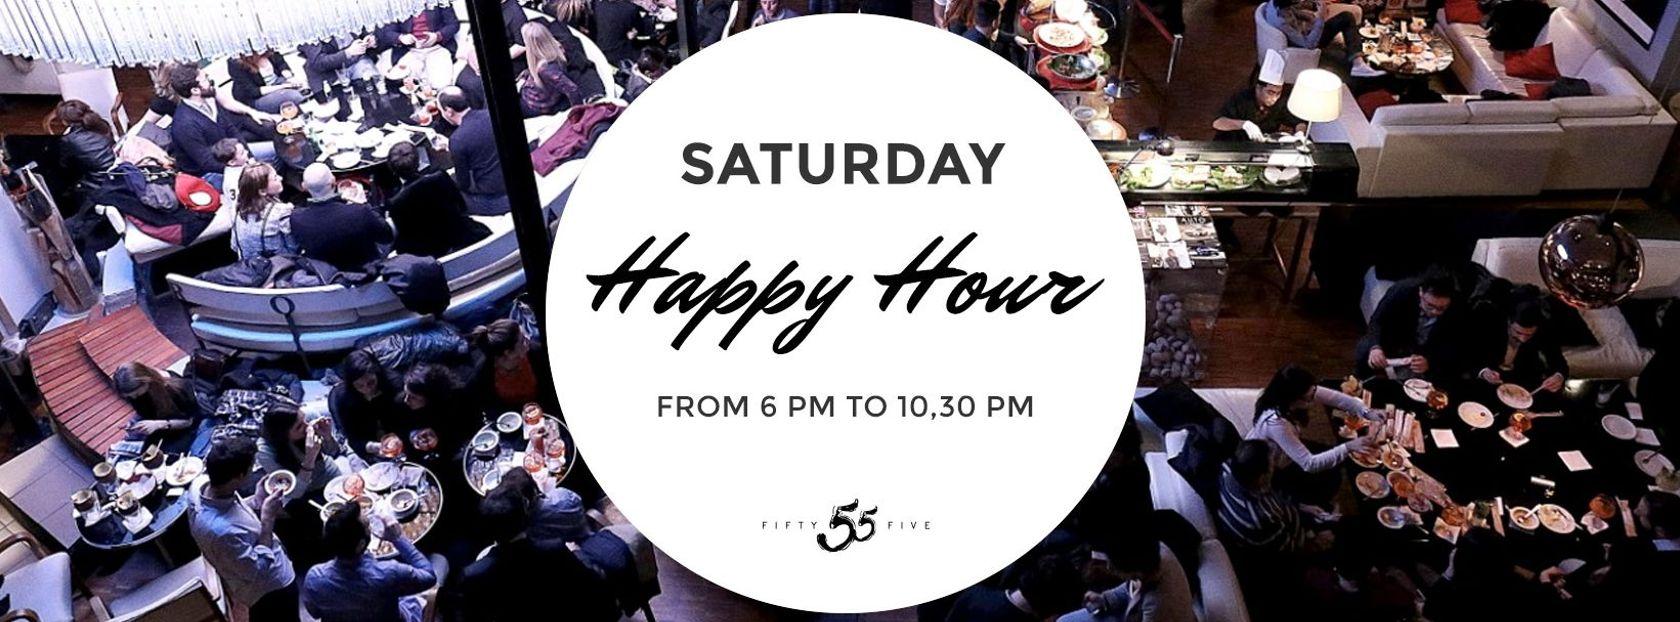 Saturday - Happy Hour